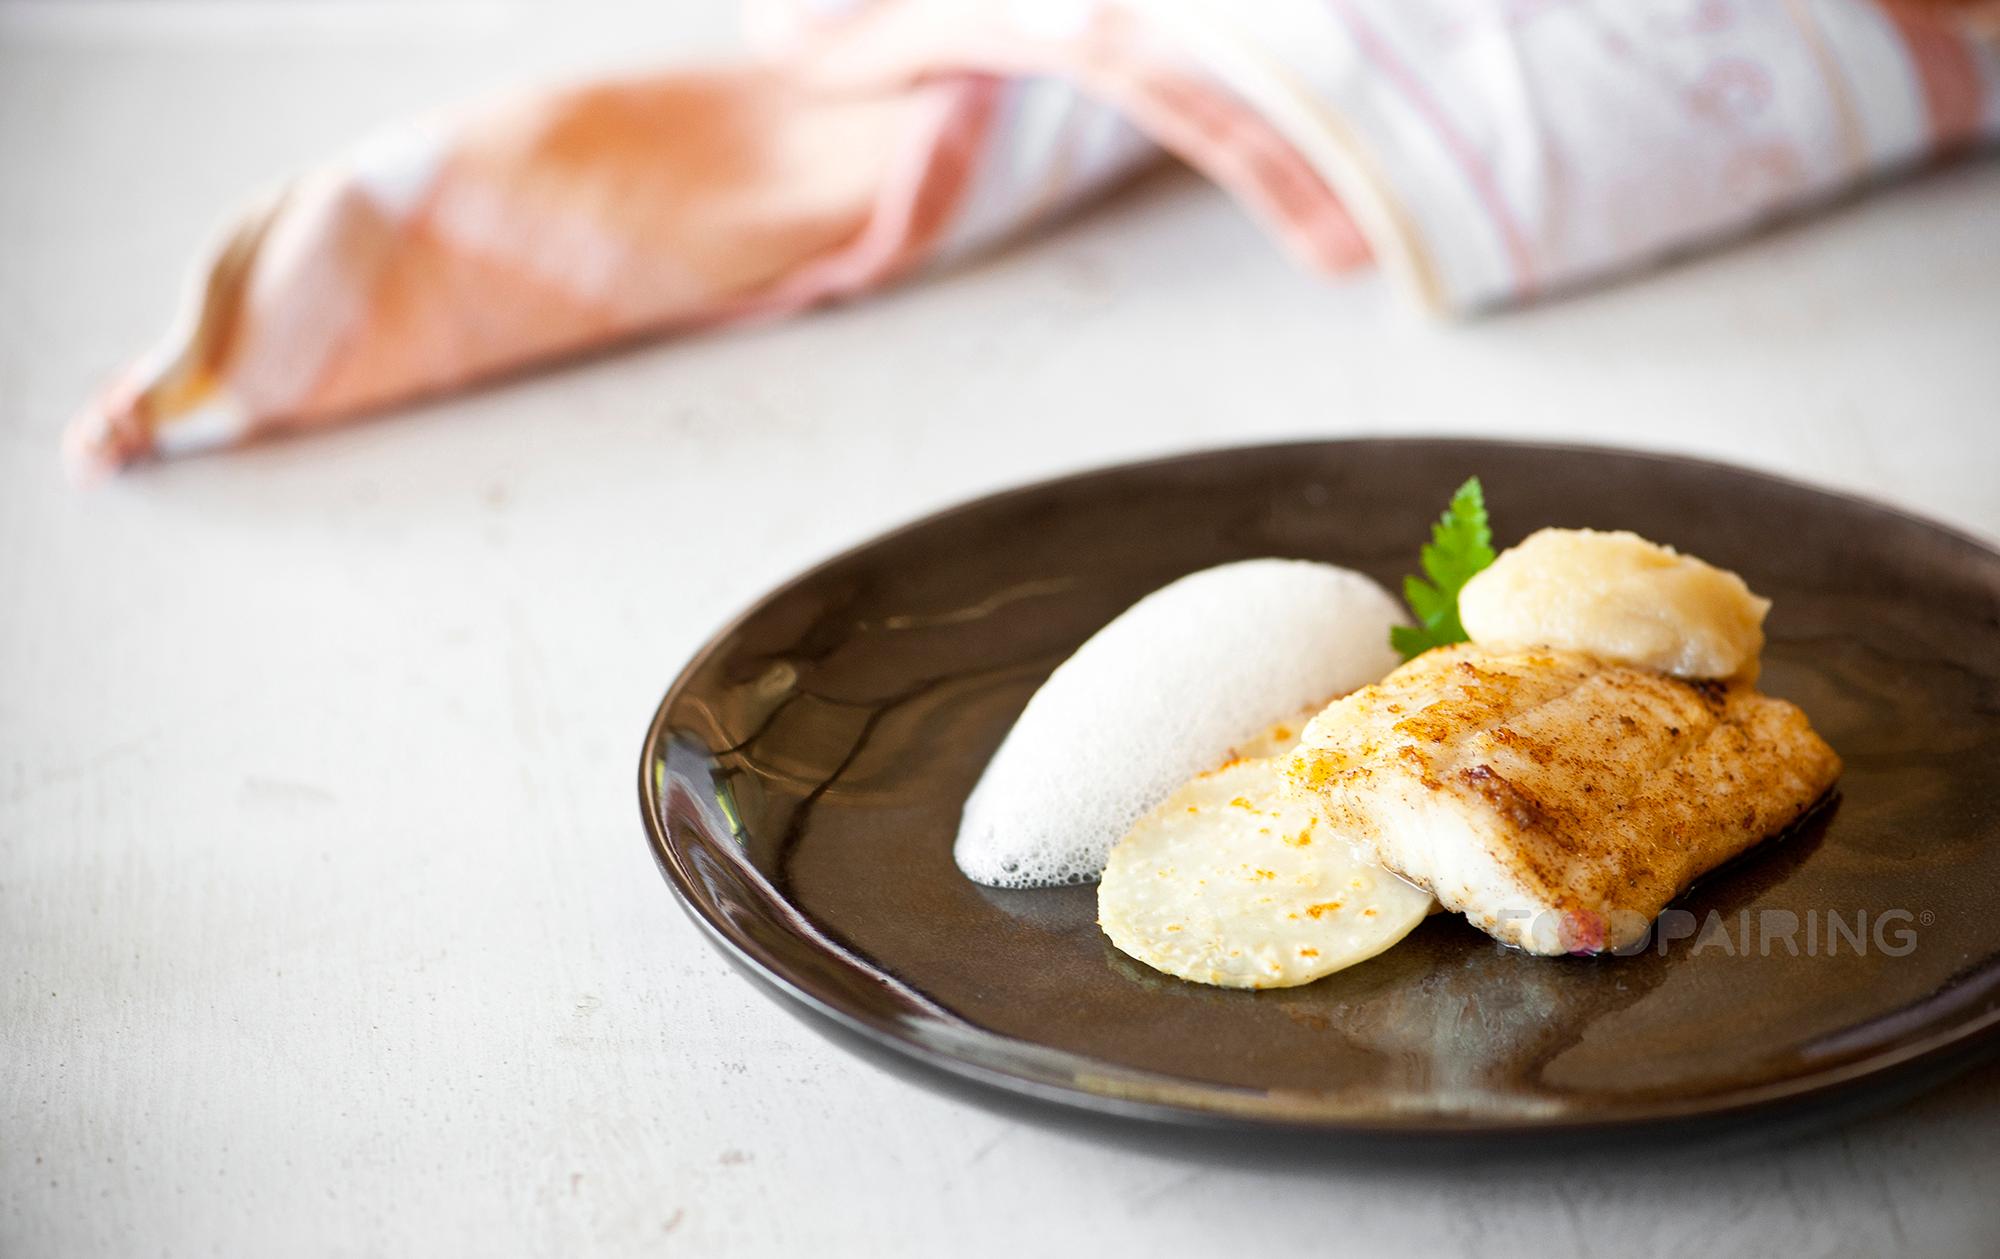 http://blog-assets.foodpairing.com/2016/11/Celeriac-Plaice.png